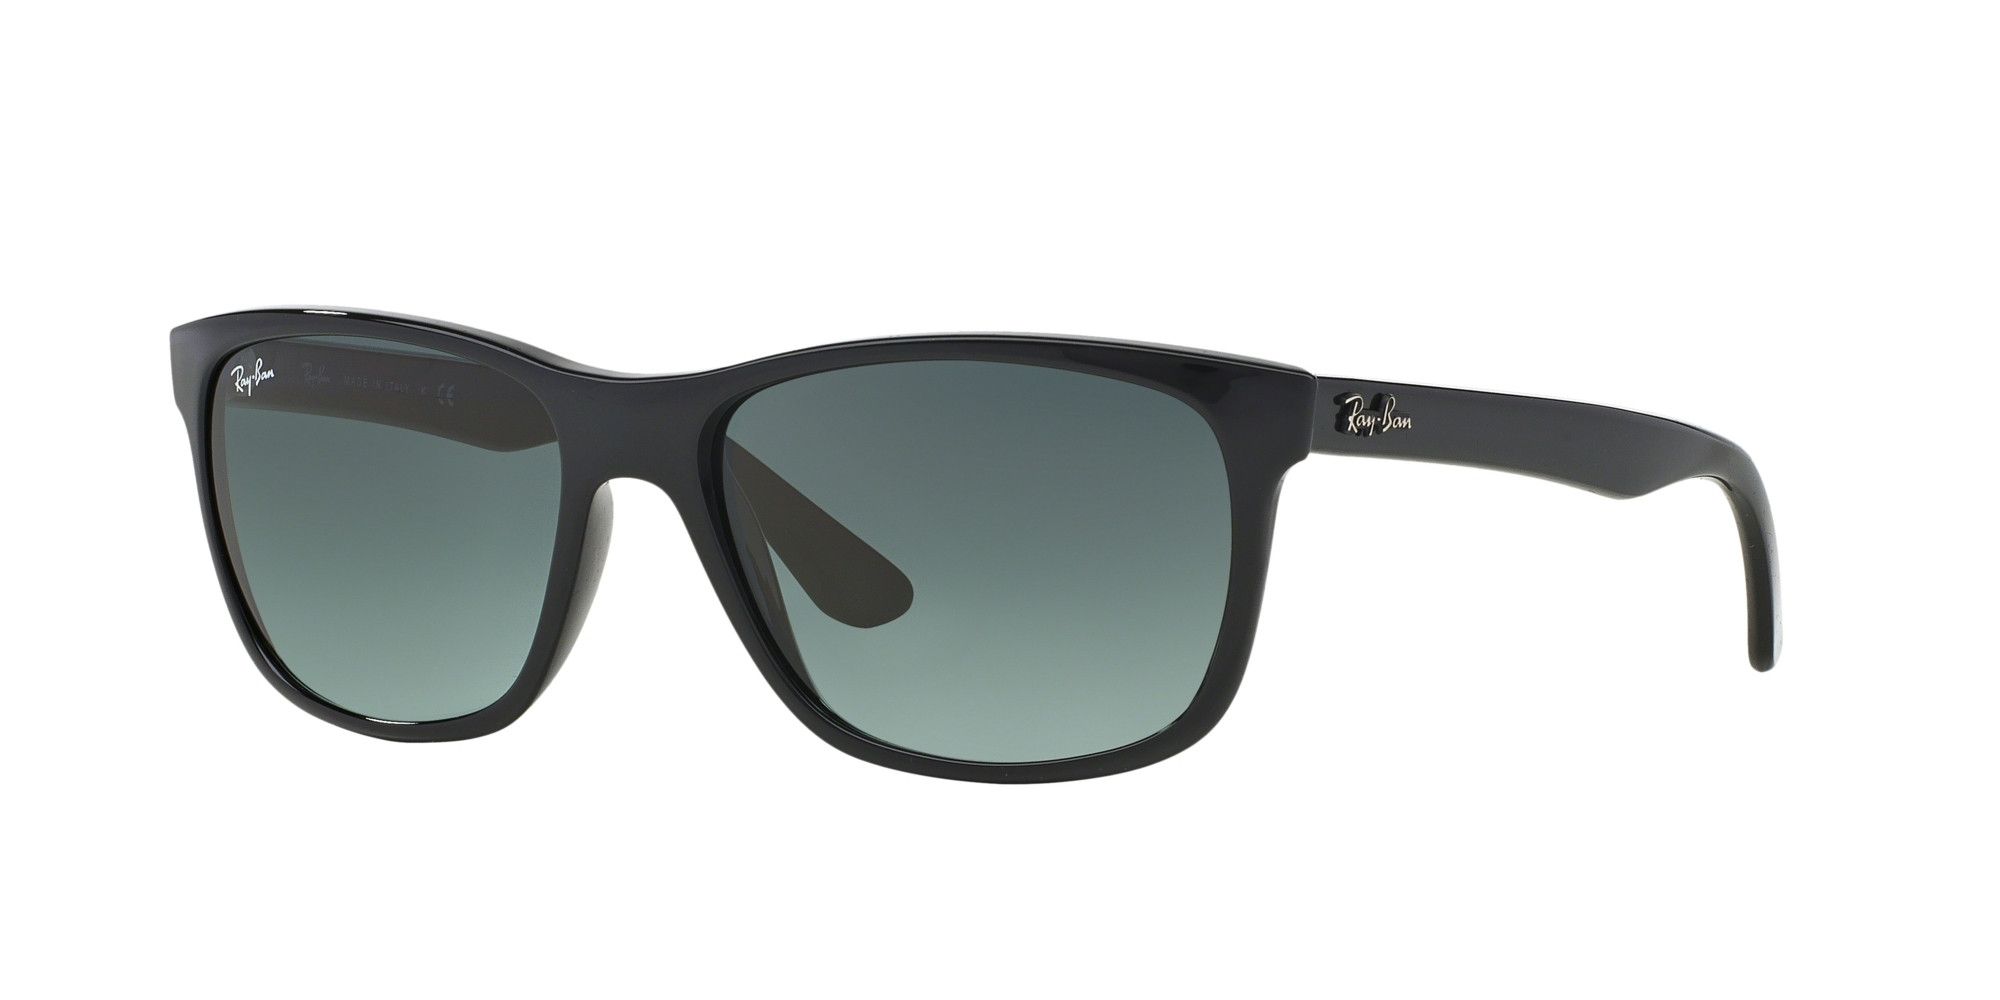 Gafas de sol RAY-BAN RB 4181 601/71 HIGH STREET